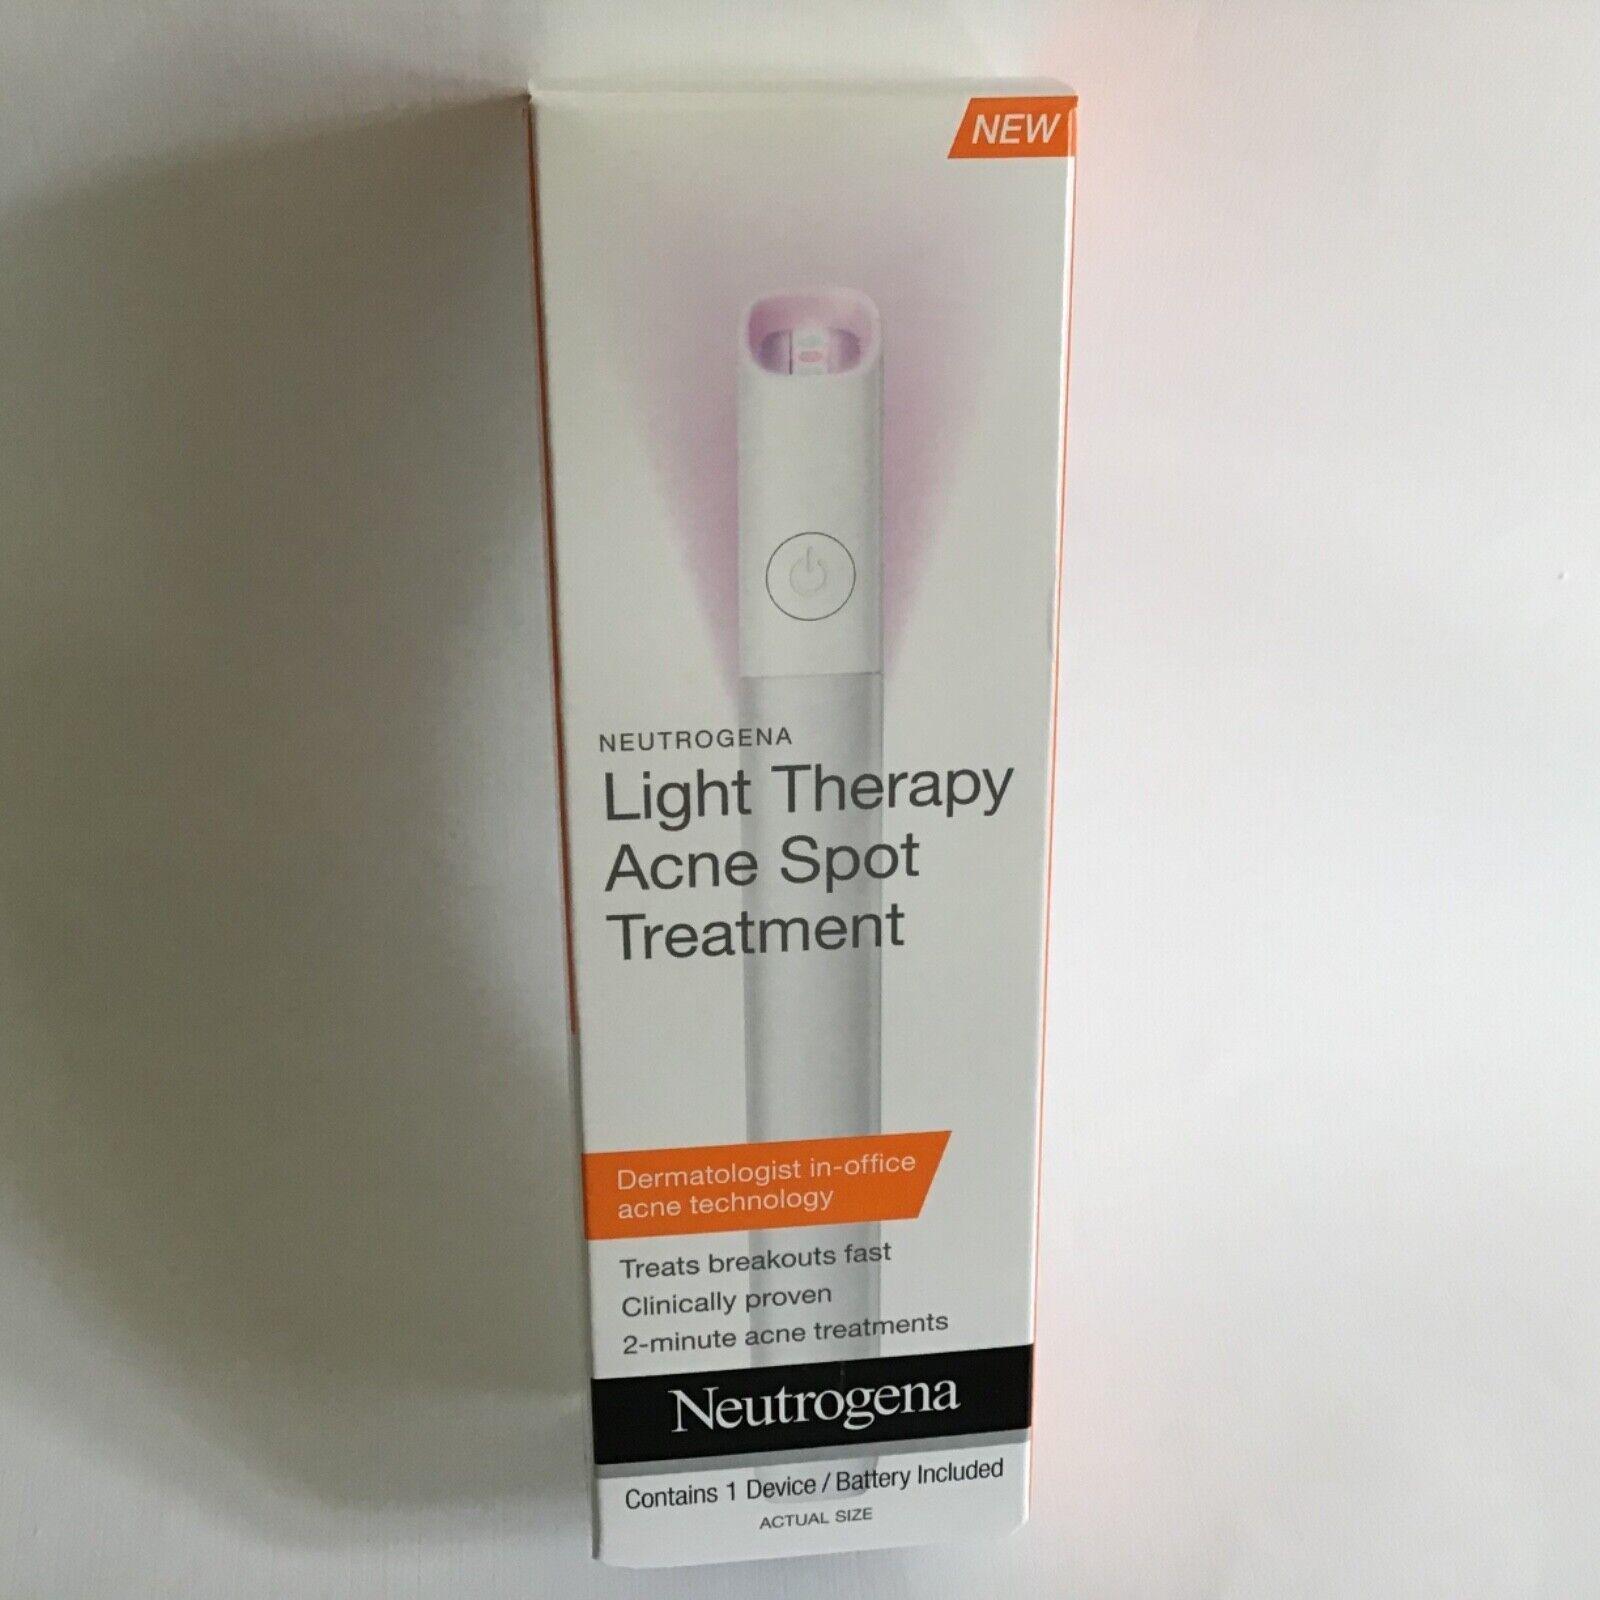 Neutrogena Light Therapy Acne Spot Treatment New Unopened